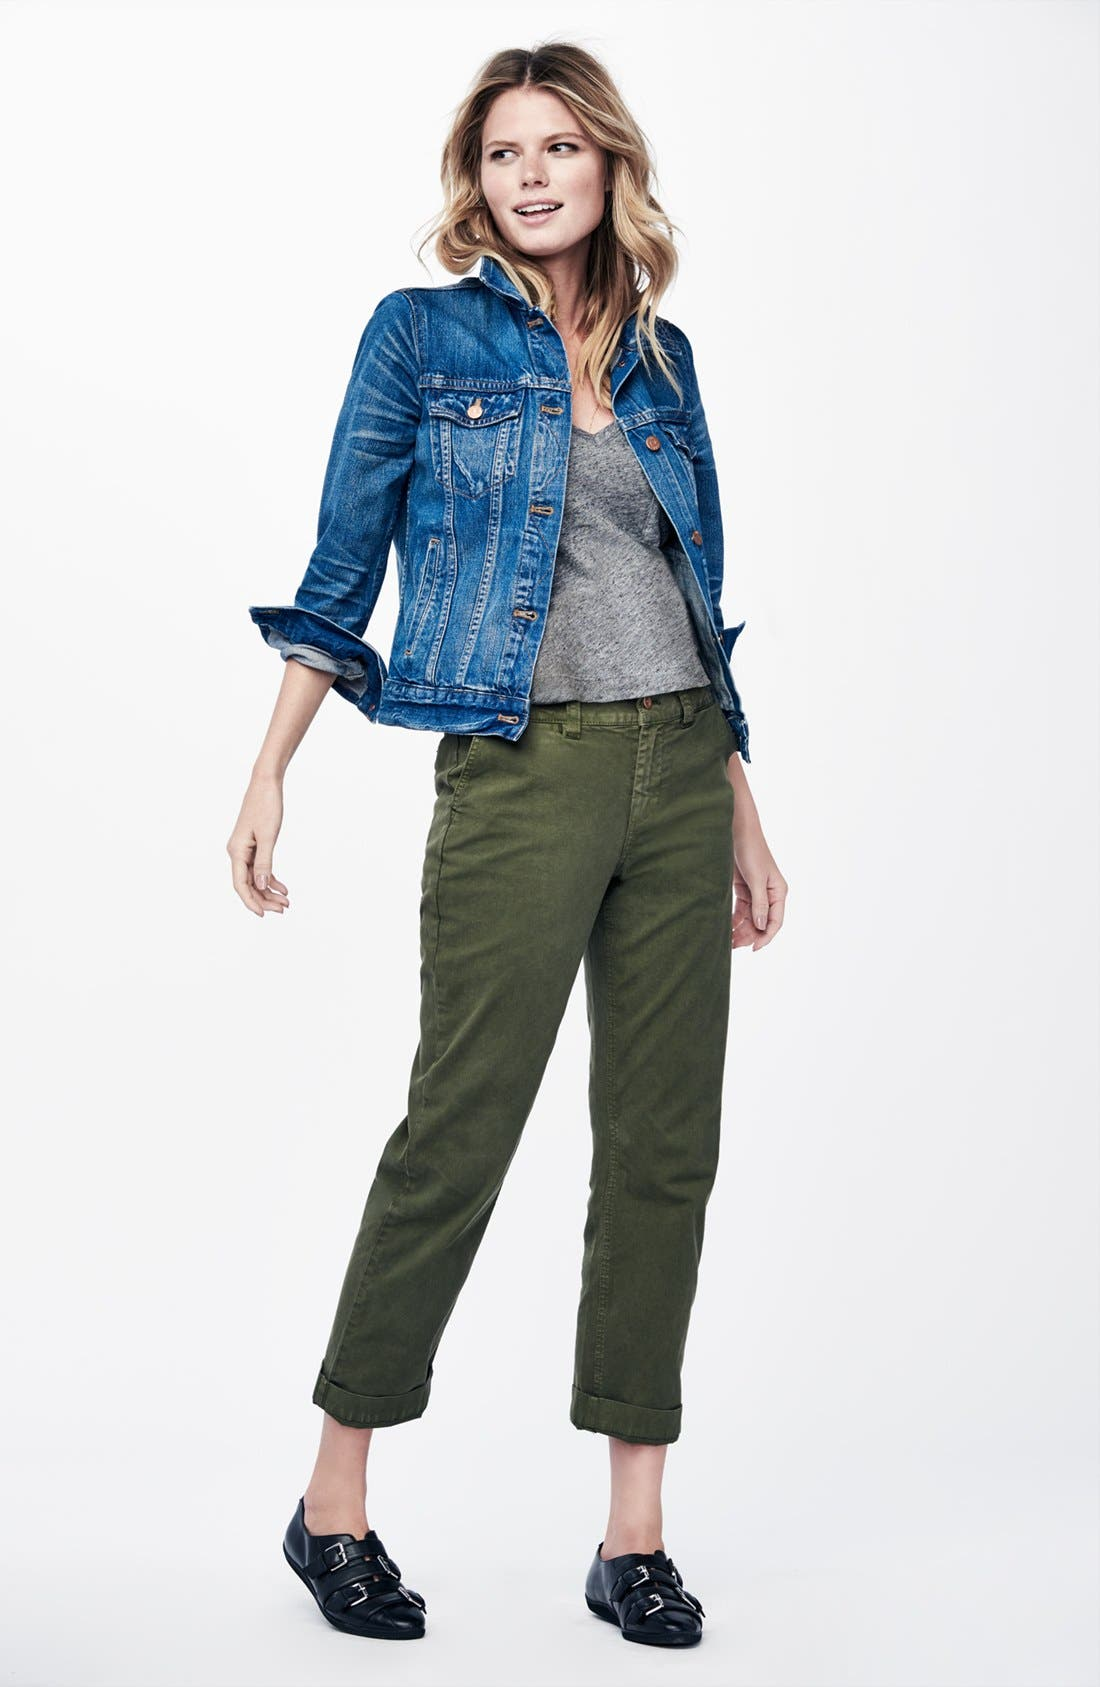 Madewell Jacket, Tee & Pants